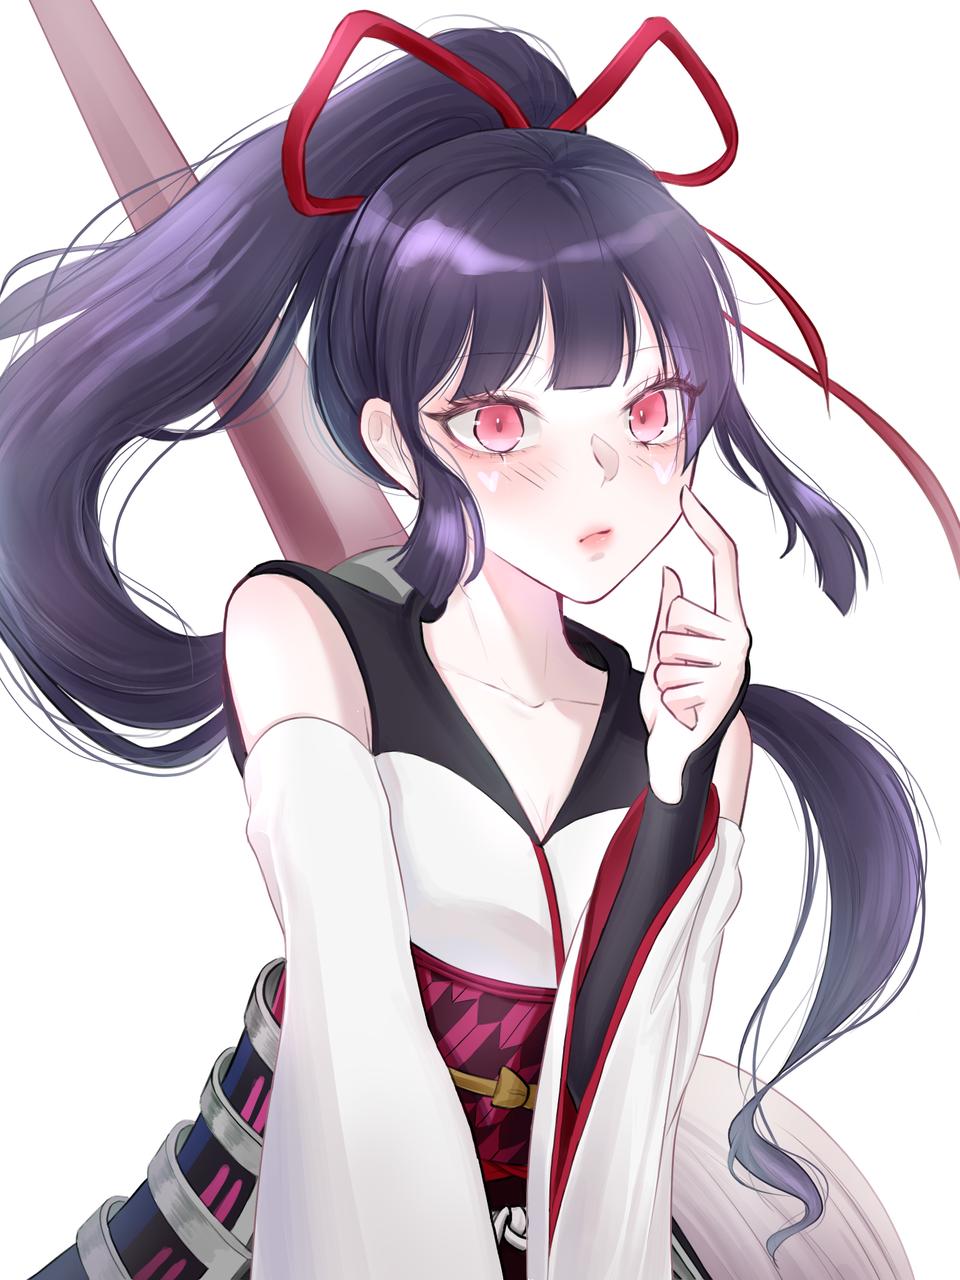 Illust of 유월 MediBang_General_Election General_Election_Ayame purple girl medibangpaint